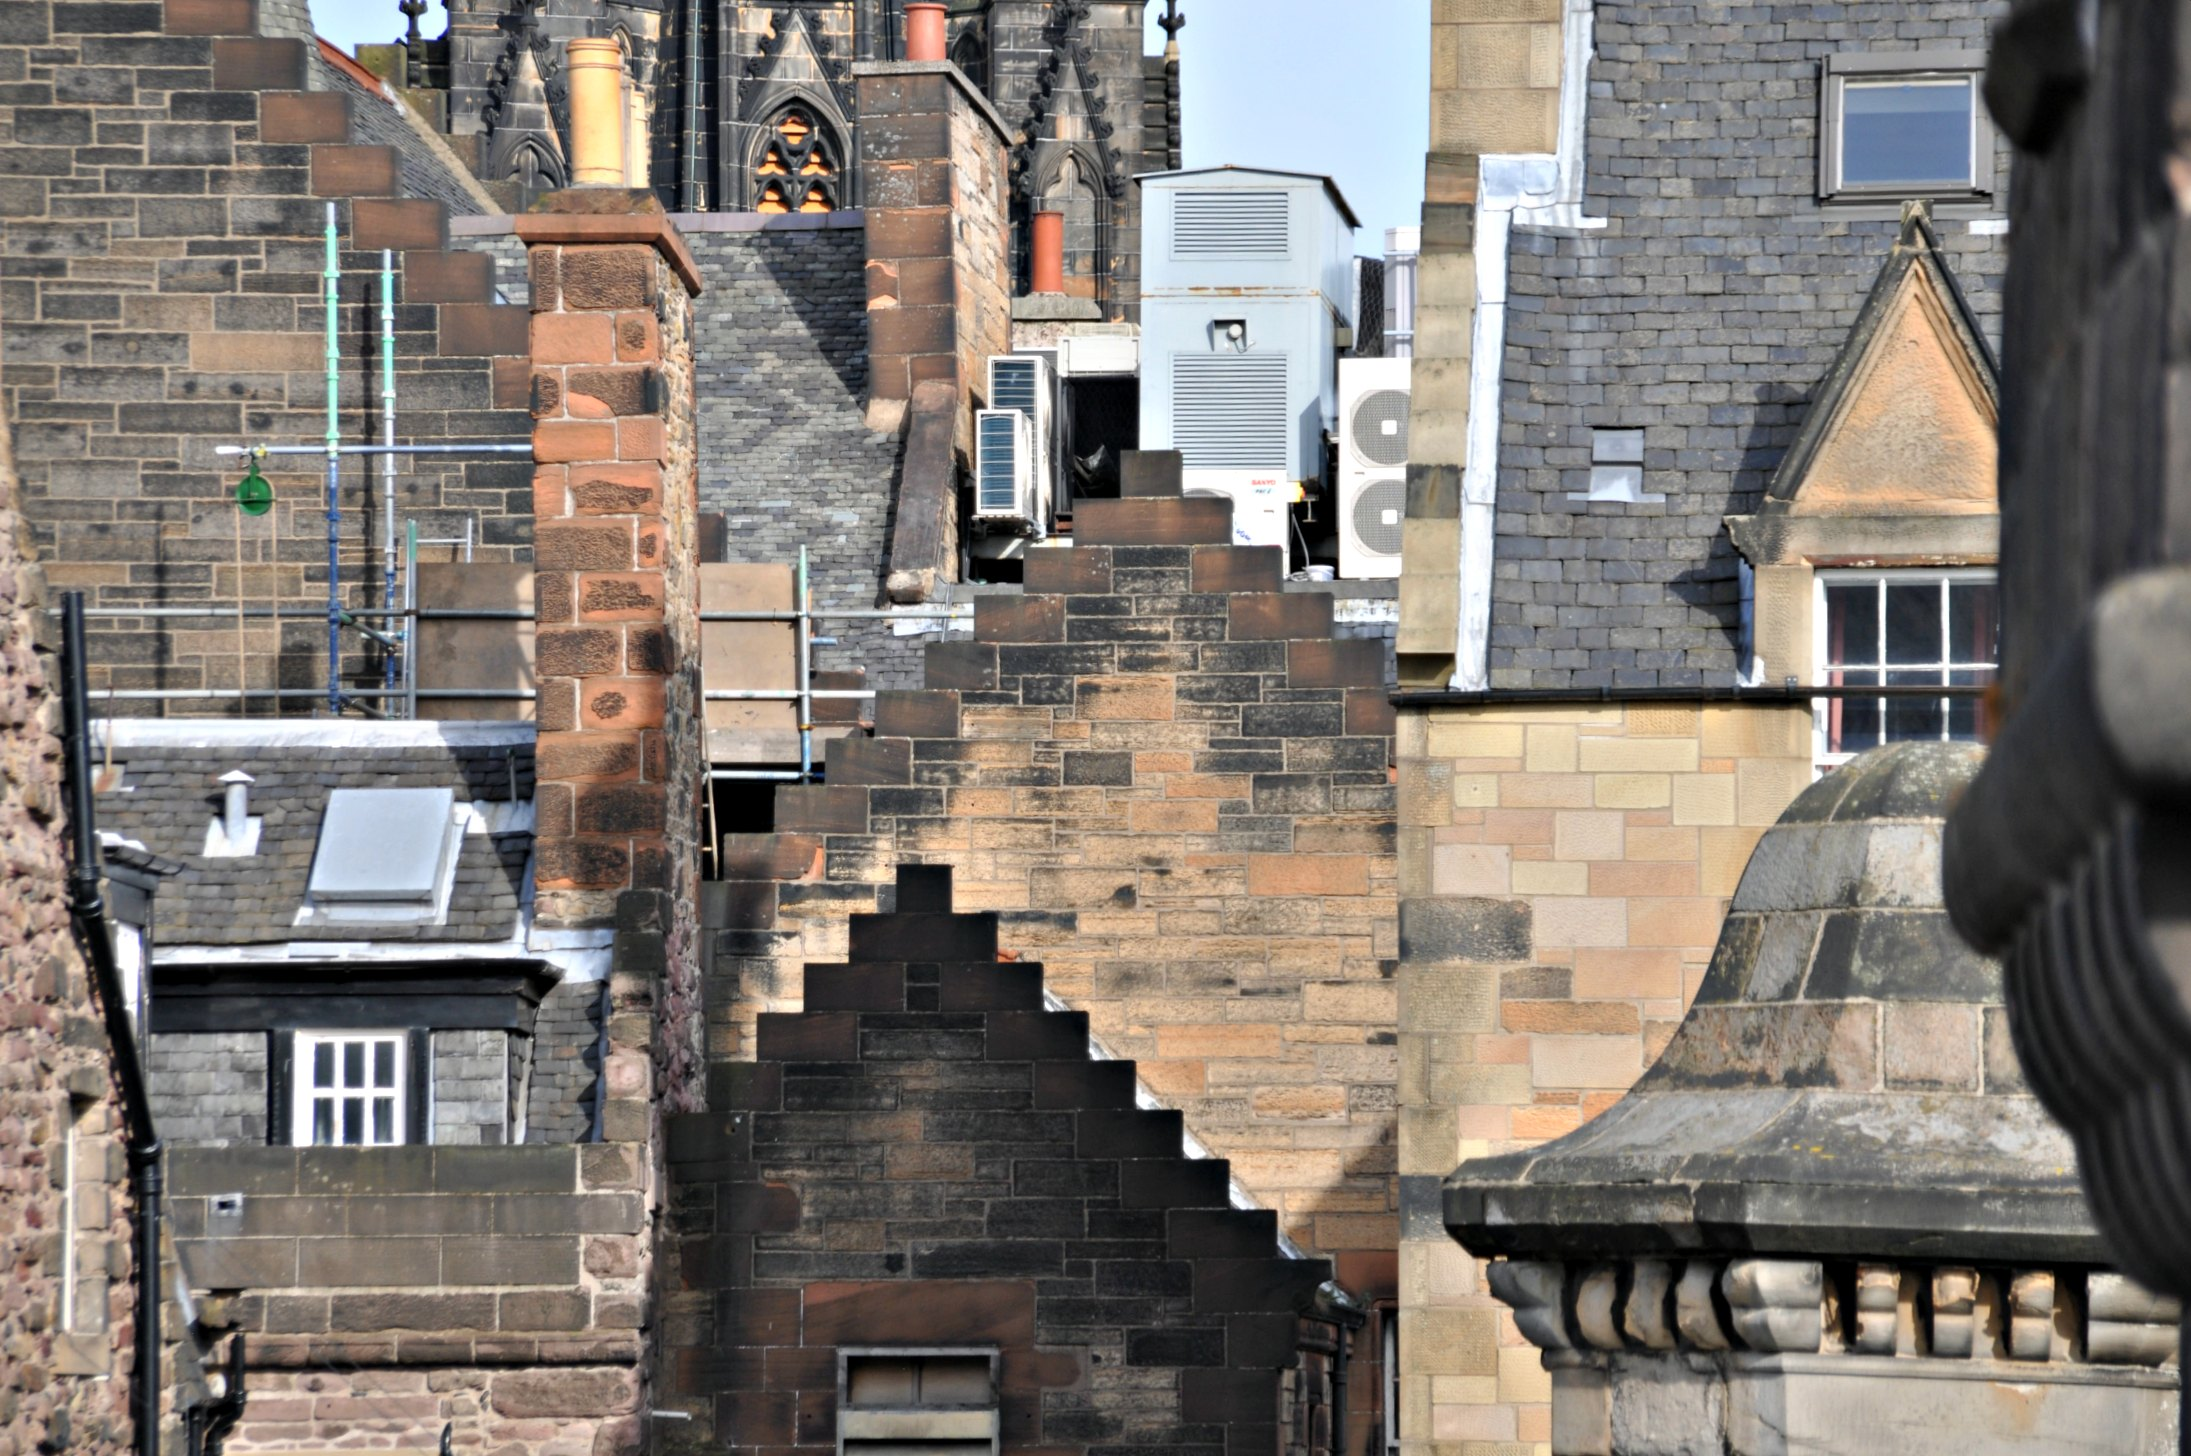 Edinburgh - Old Town roof tops.